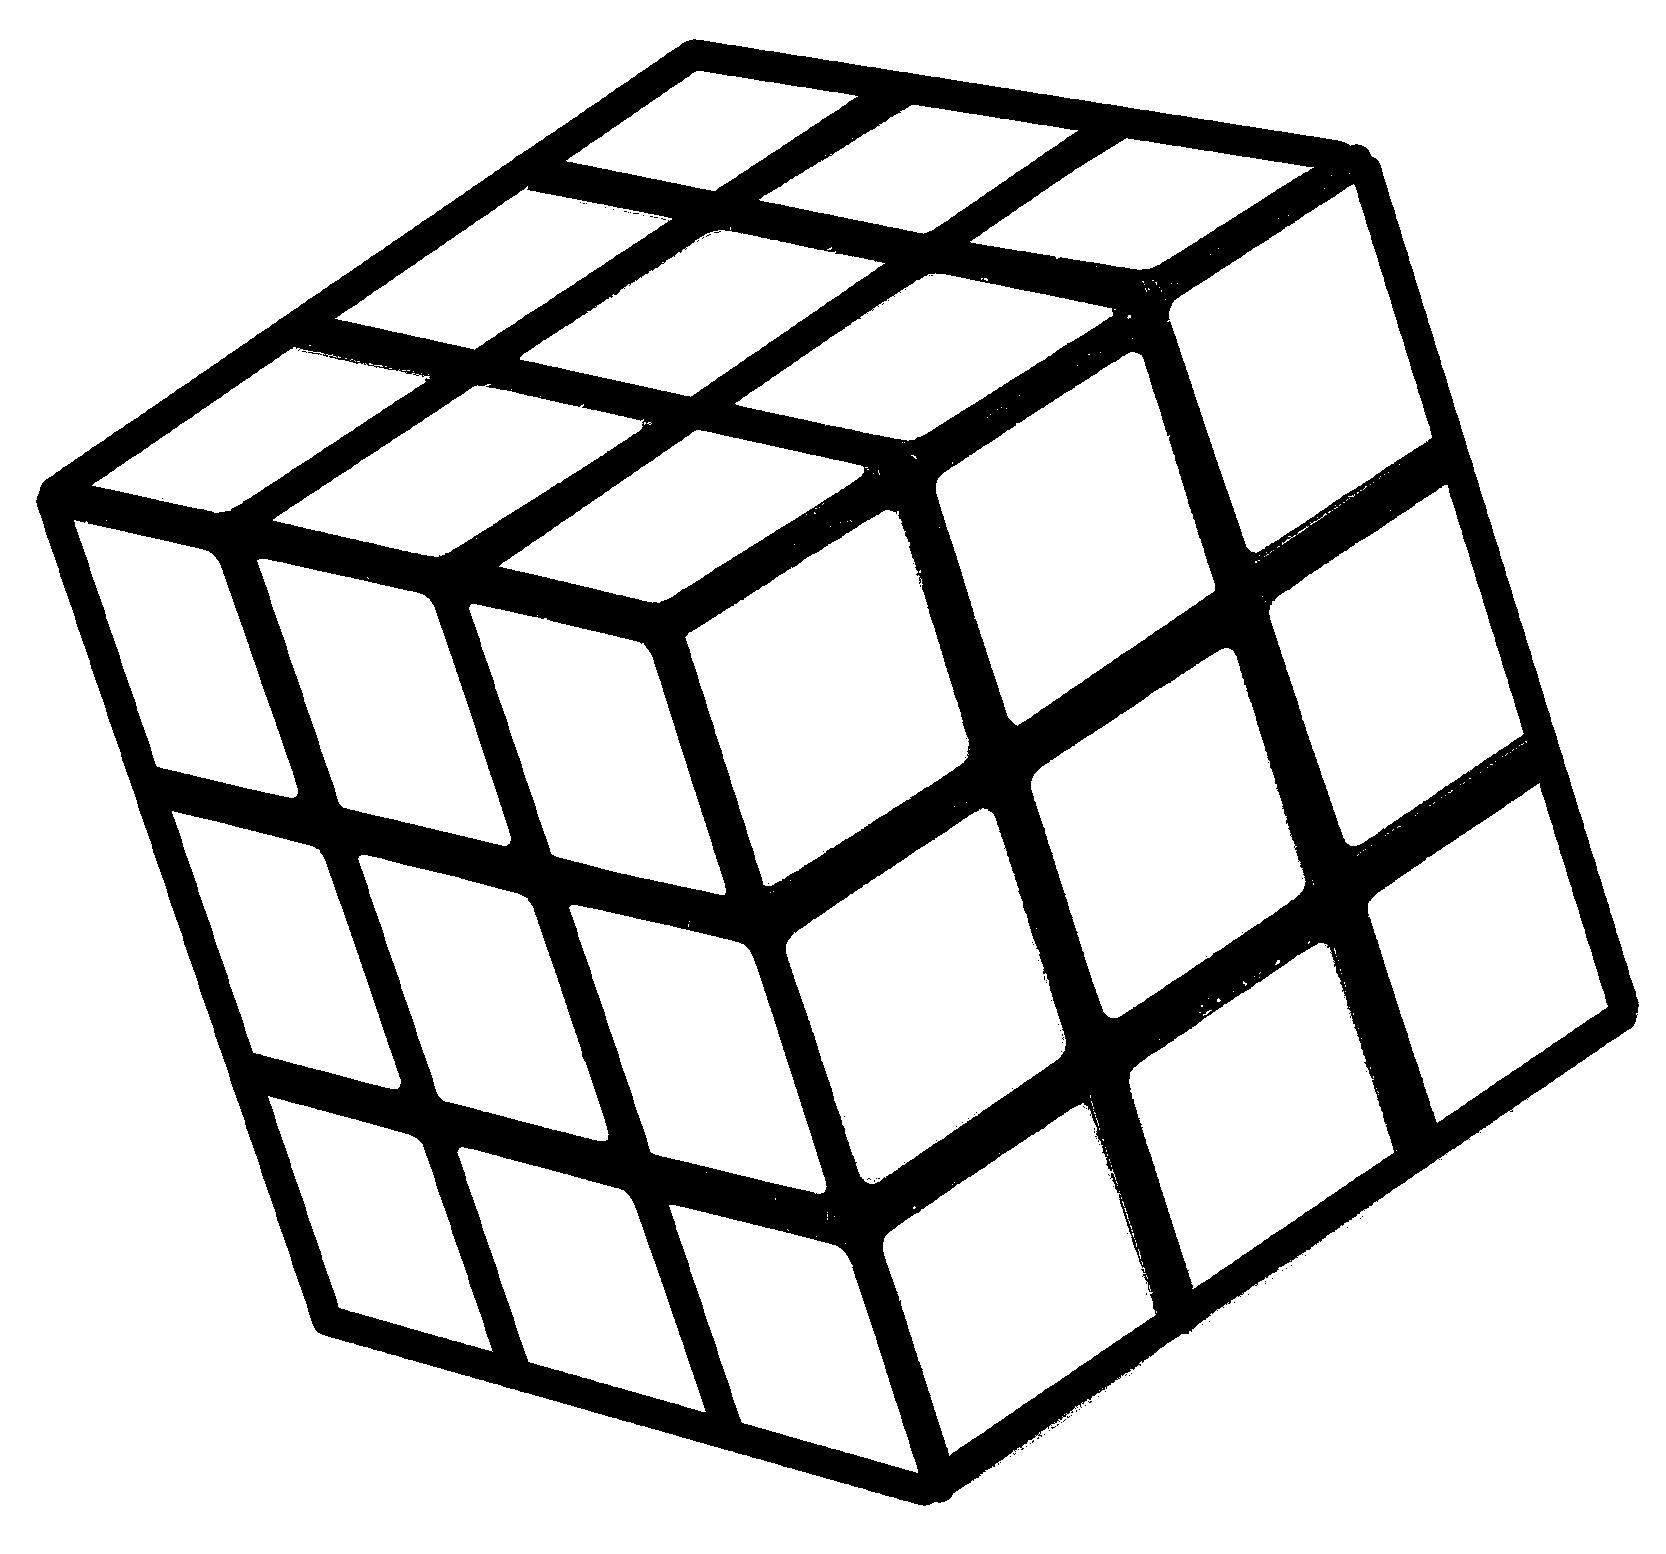 Rubiks Cube Stencil